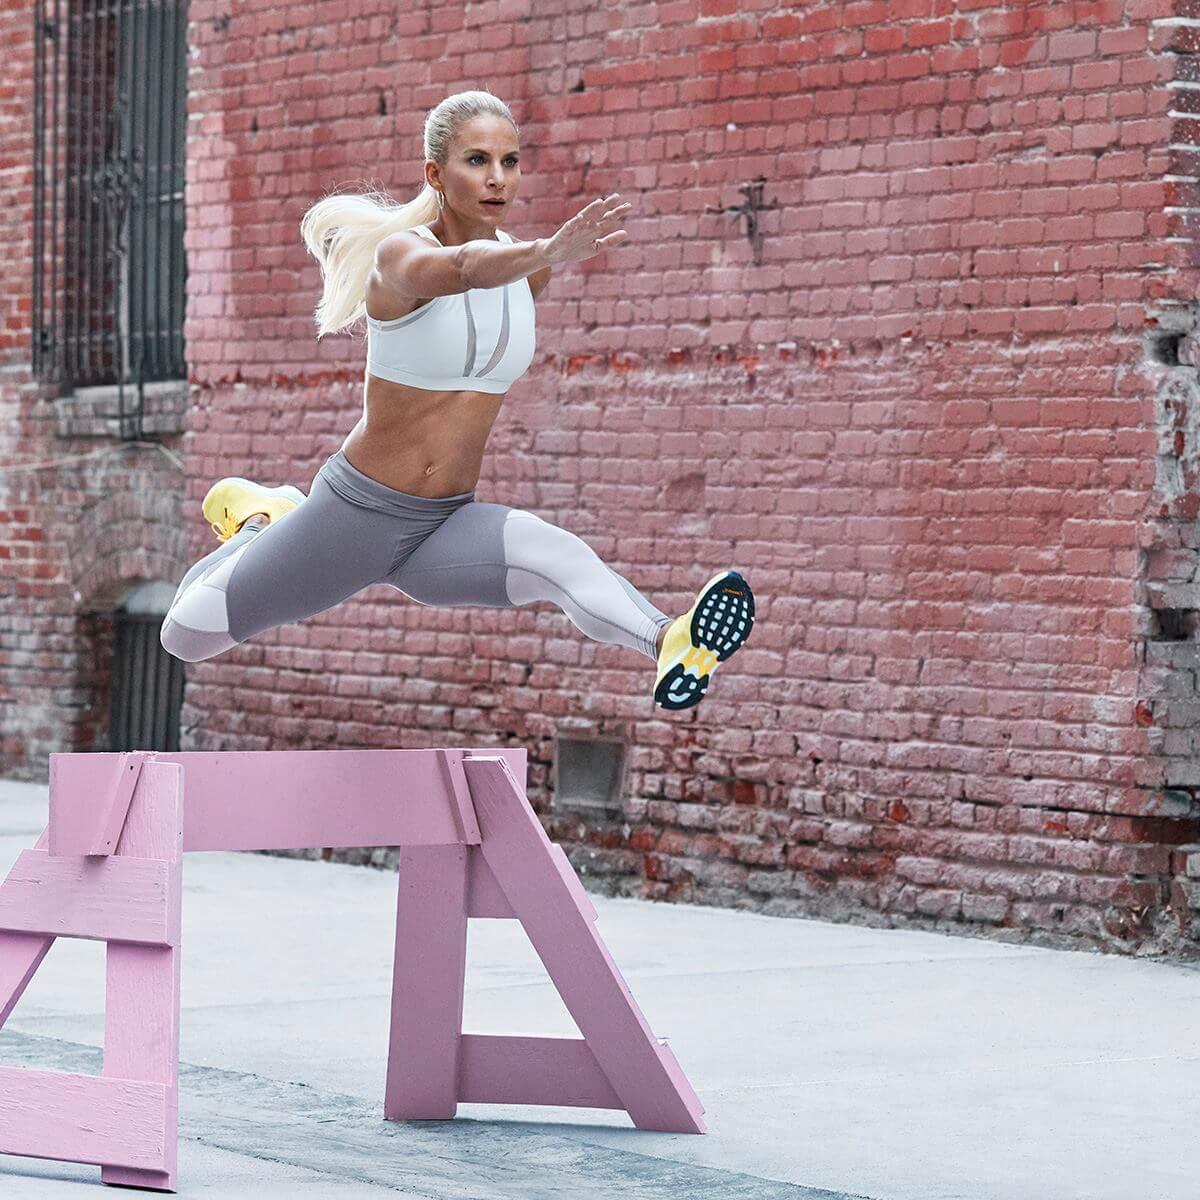 Fabletics reviews model jumping hurdles leggings sports bra